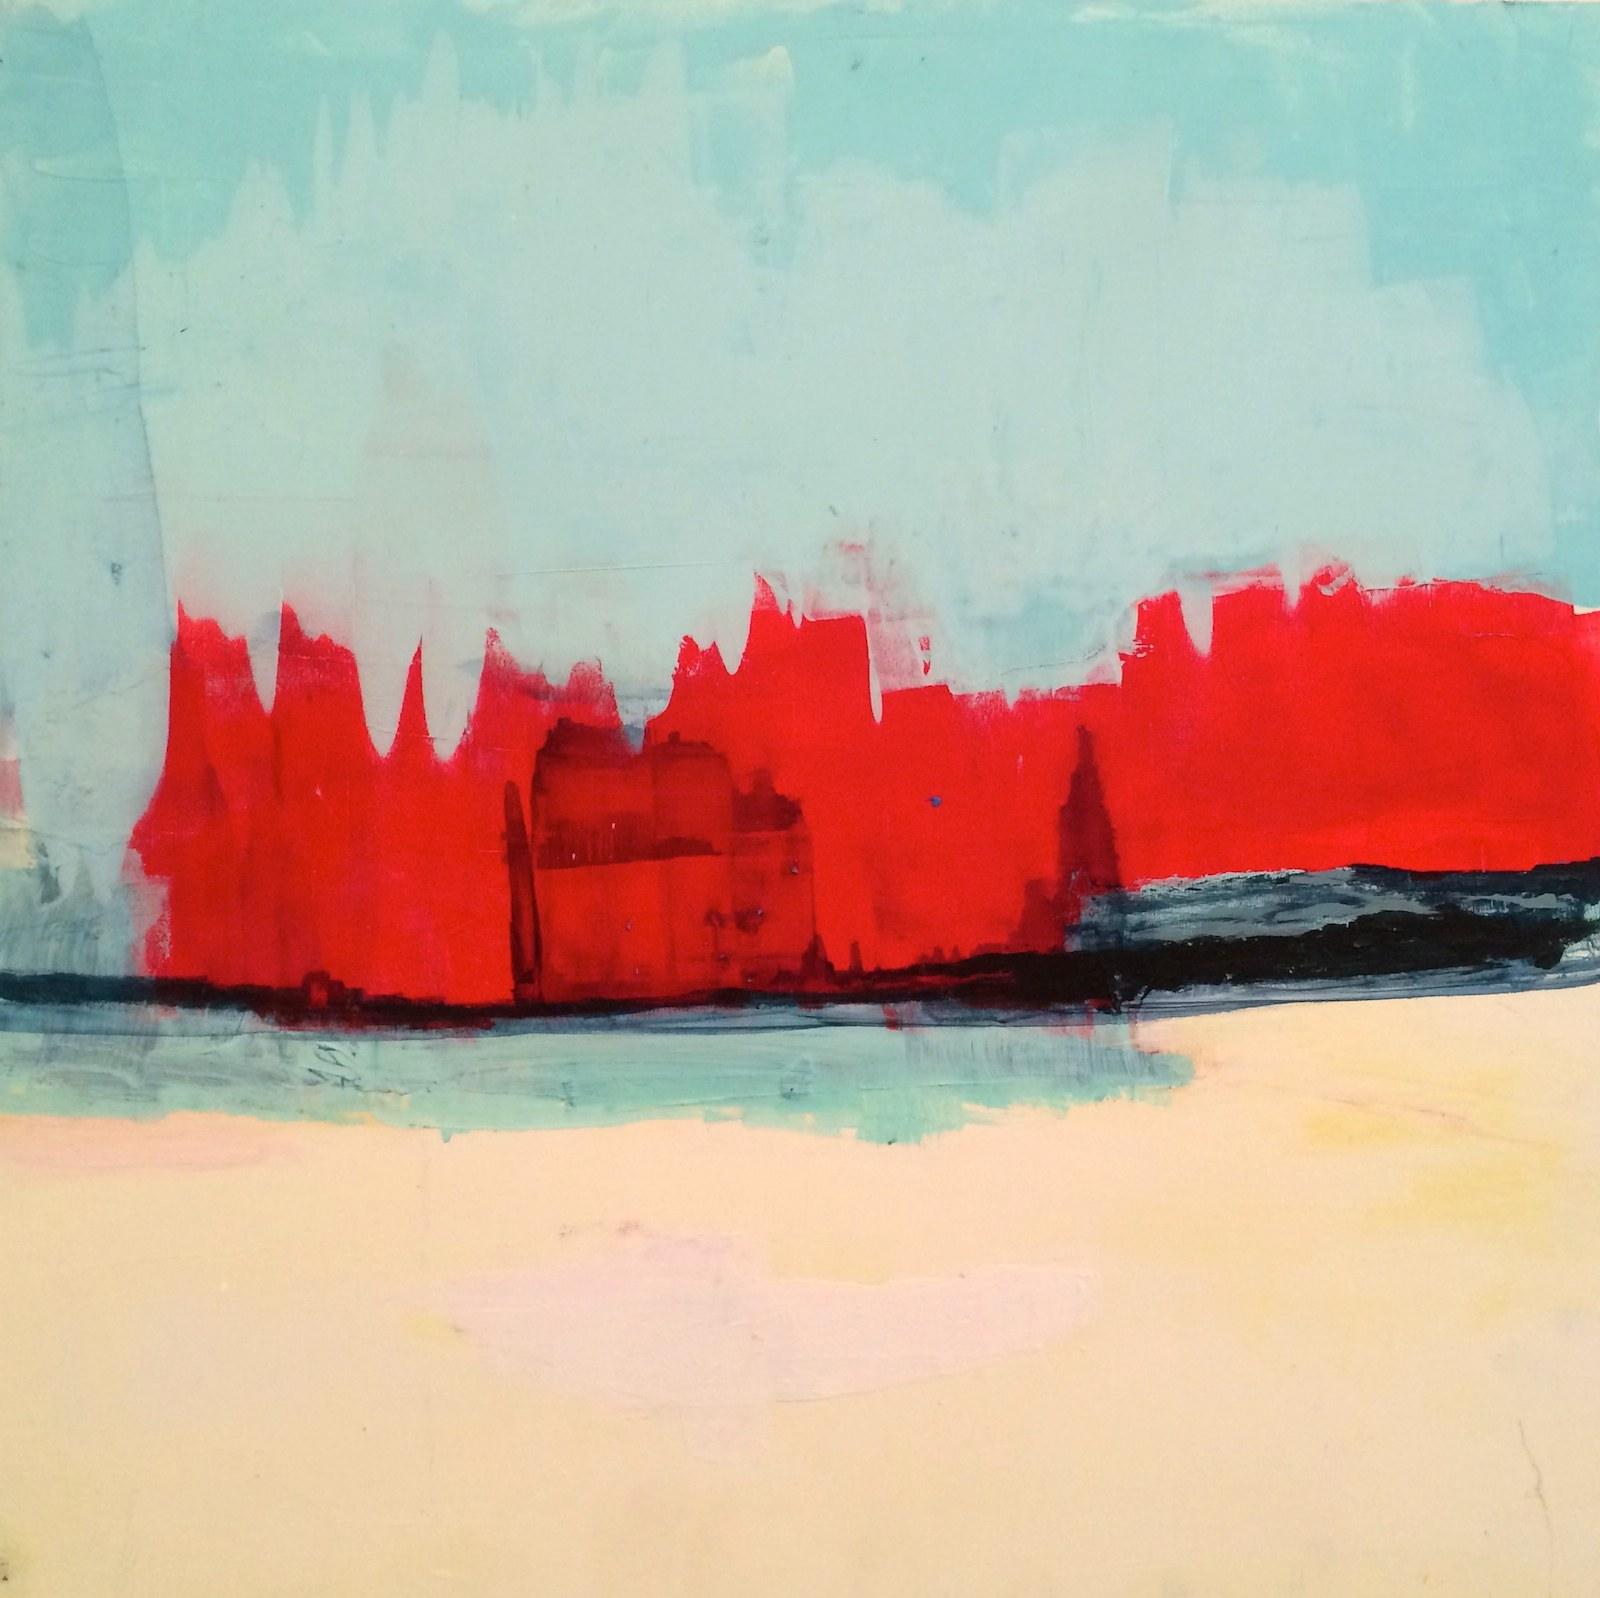 how time feels (burning), 40 x 40 cm, 2016, Jane Hughes